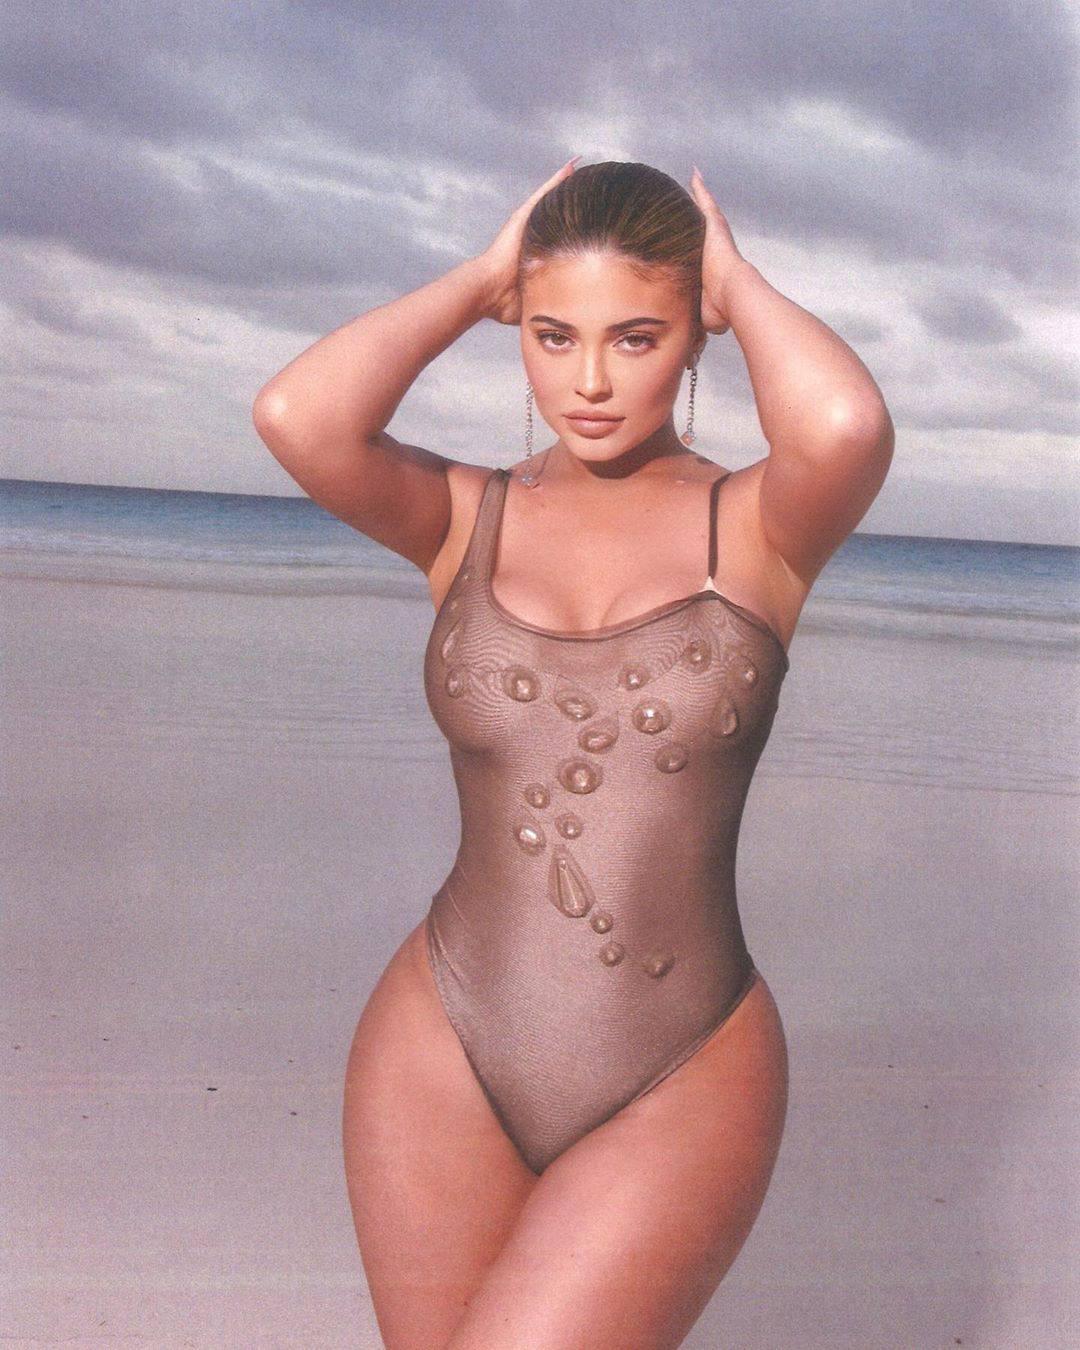 Kylie Jenner Hot Swimsuit